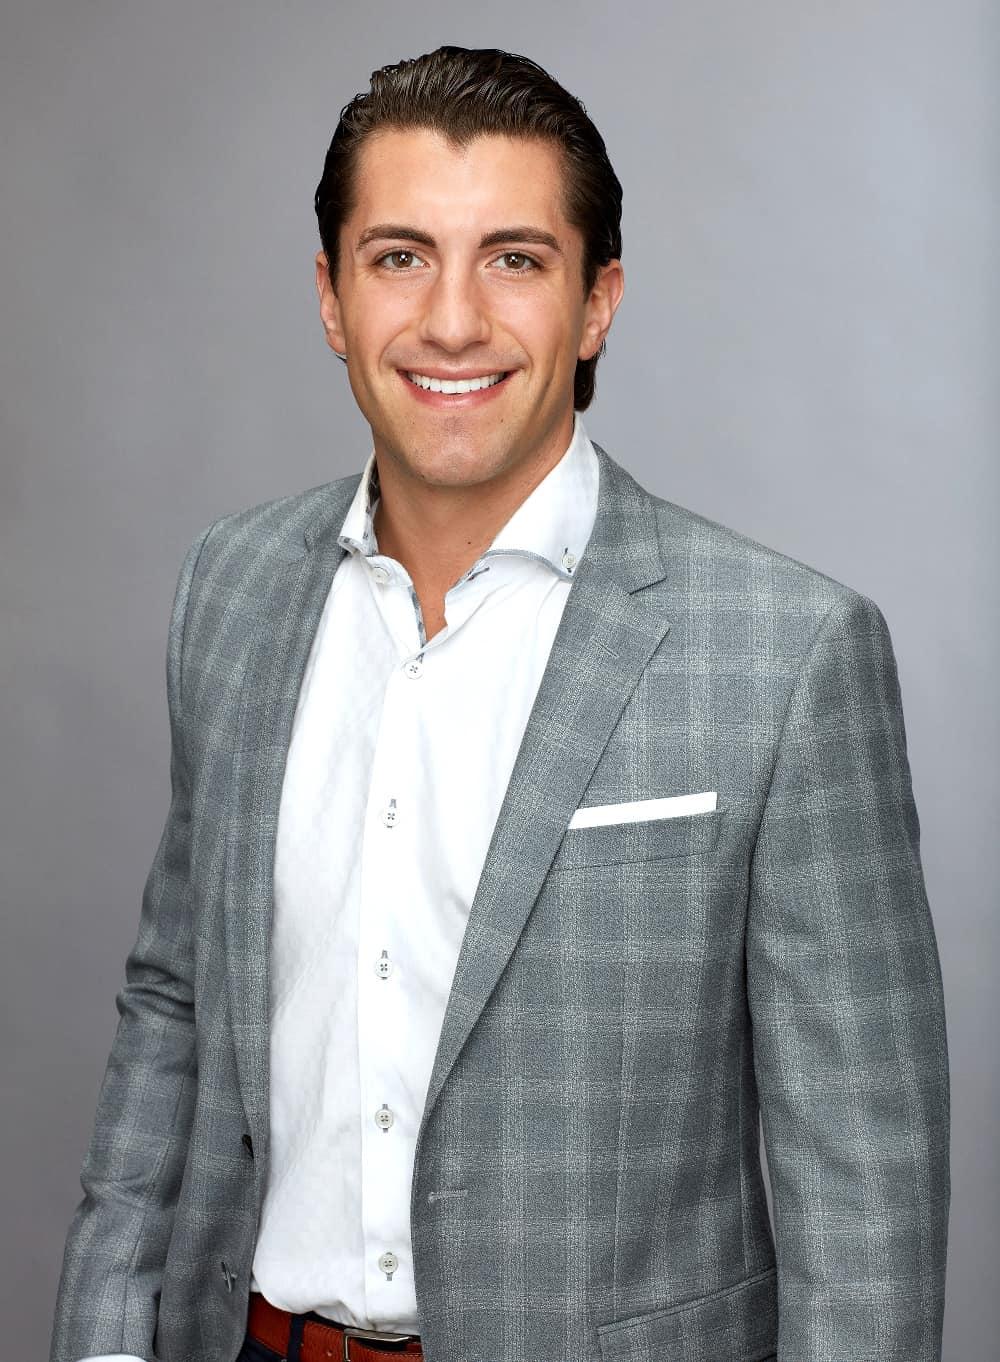 The Bachelorette Jason Tartick